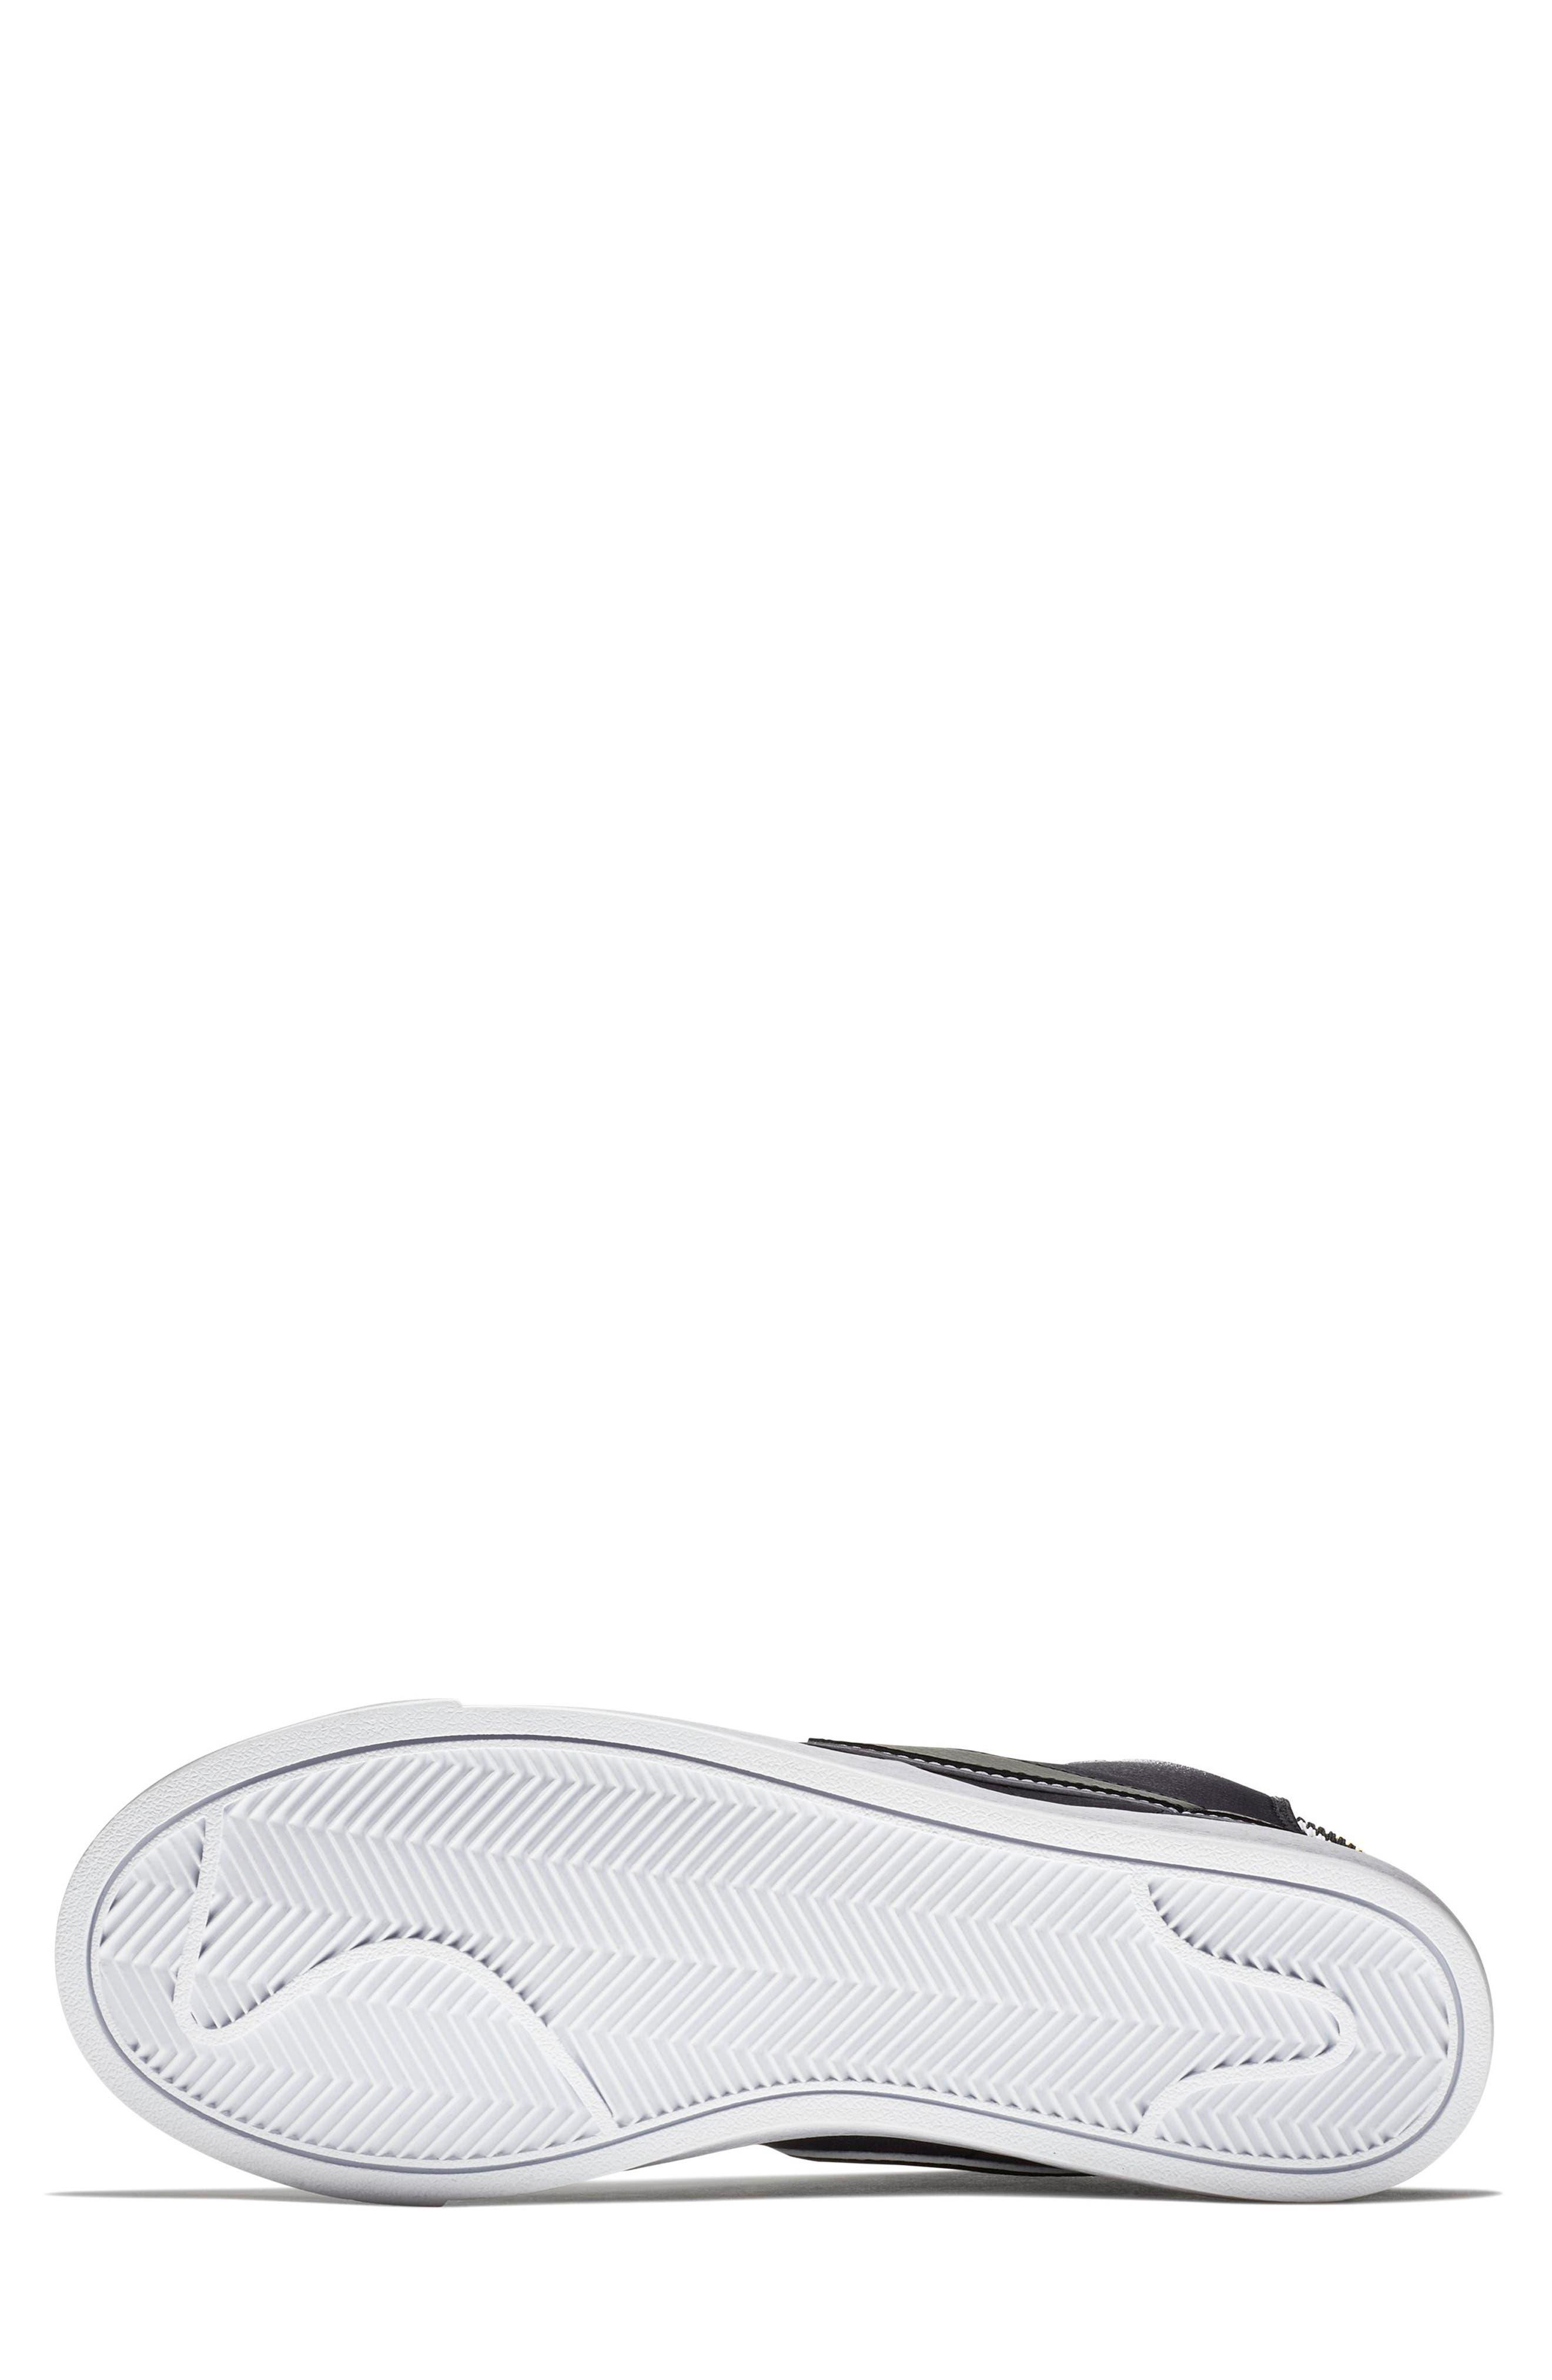 Blazer Mid Top Sneaker,                             Alternate thumbnail 5, color,                             BLACK/ BLACK